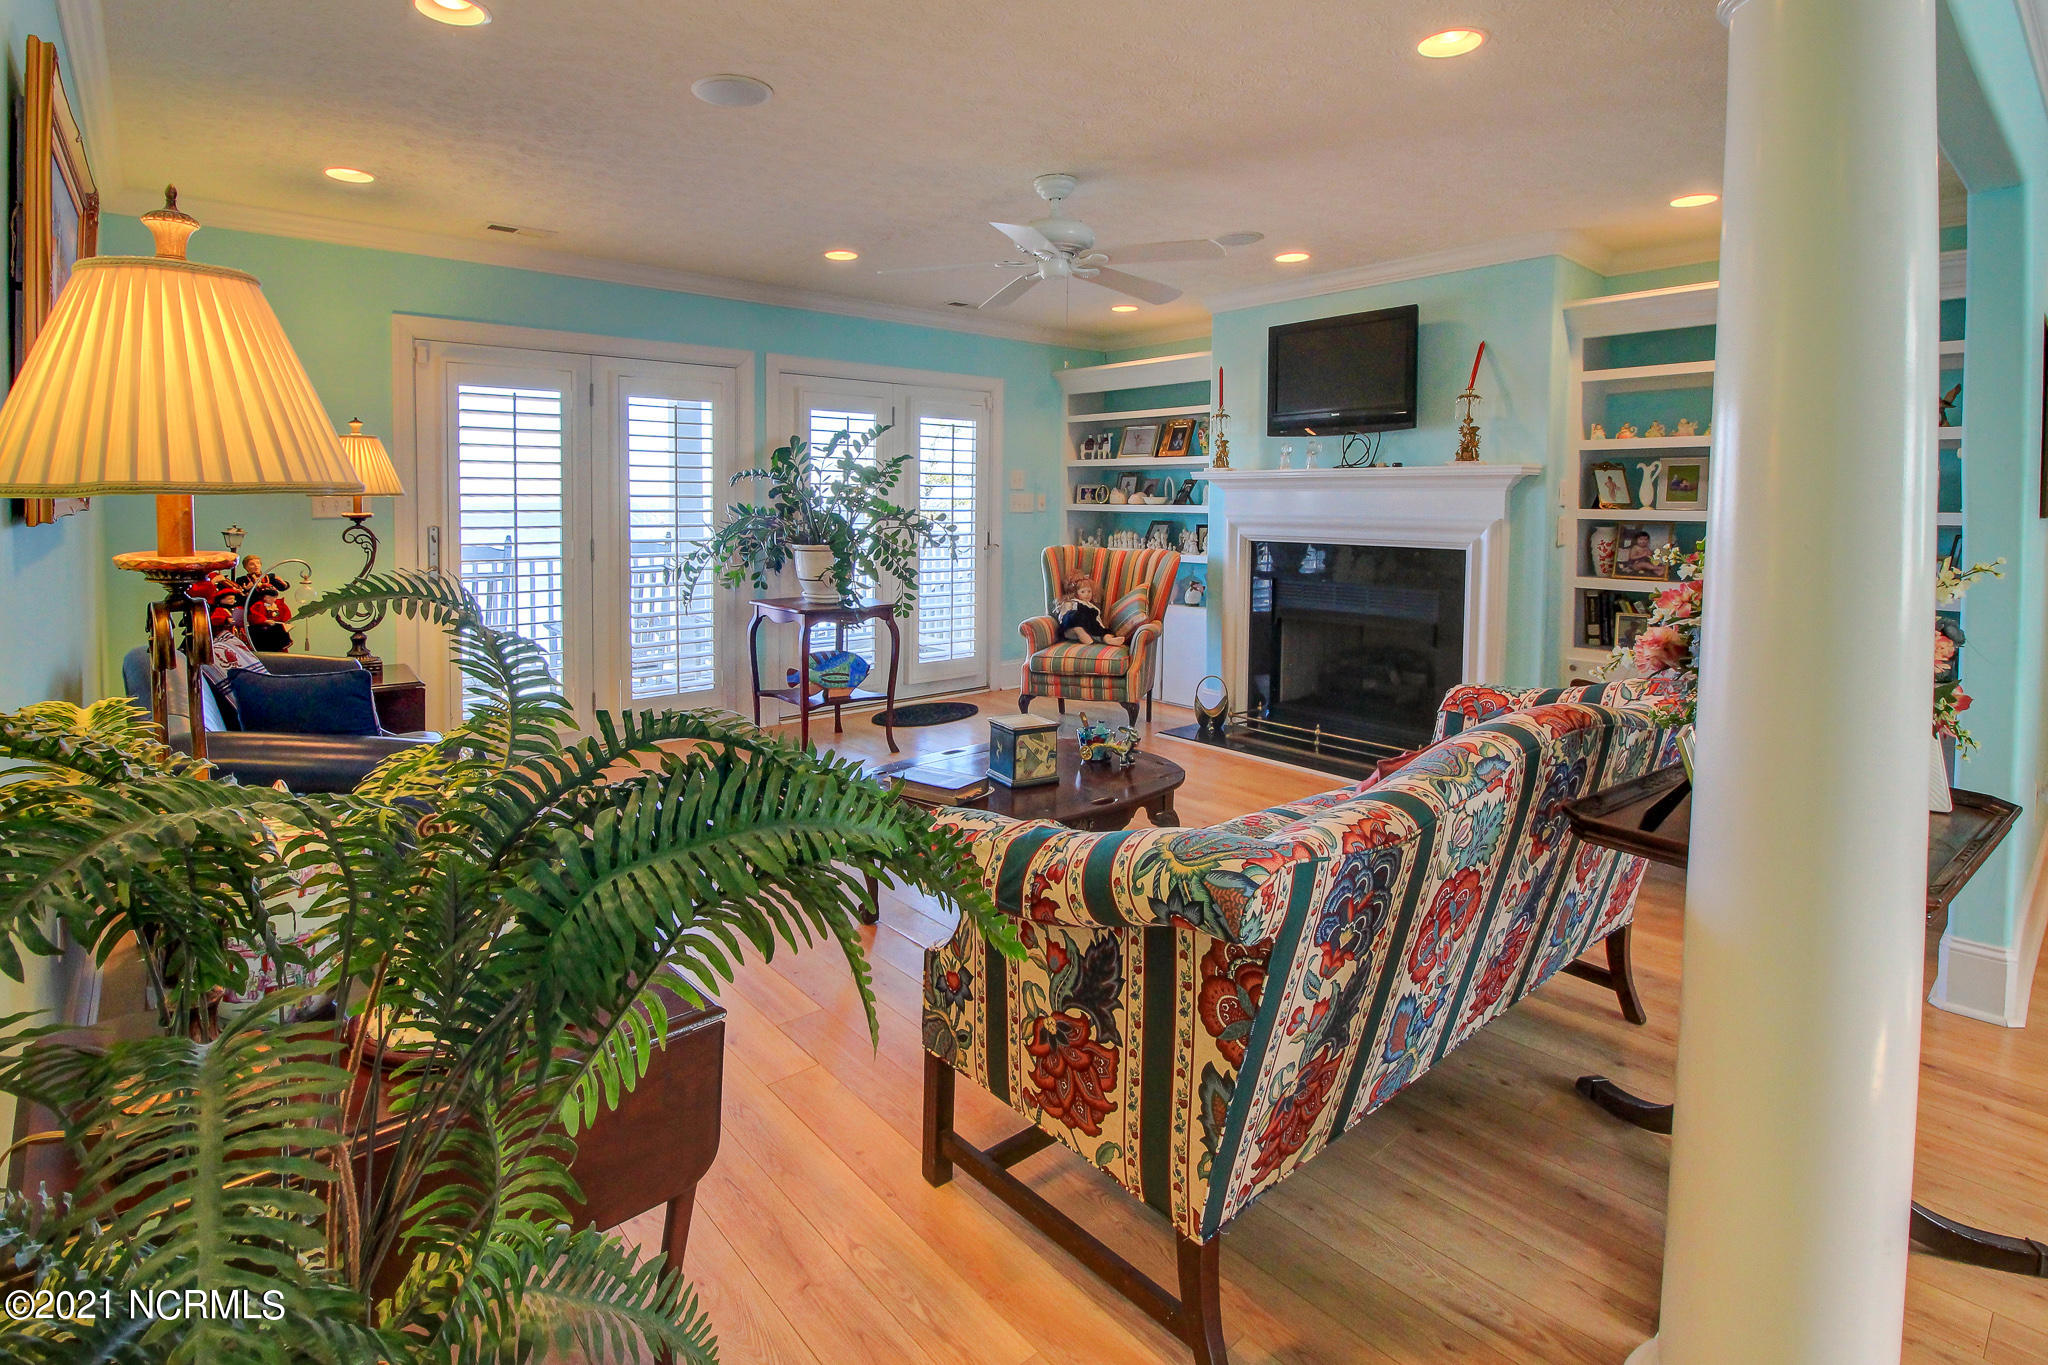 125 King Creek Drive, Havelock, North Carolina 28532, 3 Bedrooms Bedrooms, 10 Rooms Rooms,2 BathroomsBathrooms,Single family residence,For sale,King Creek,100200330